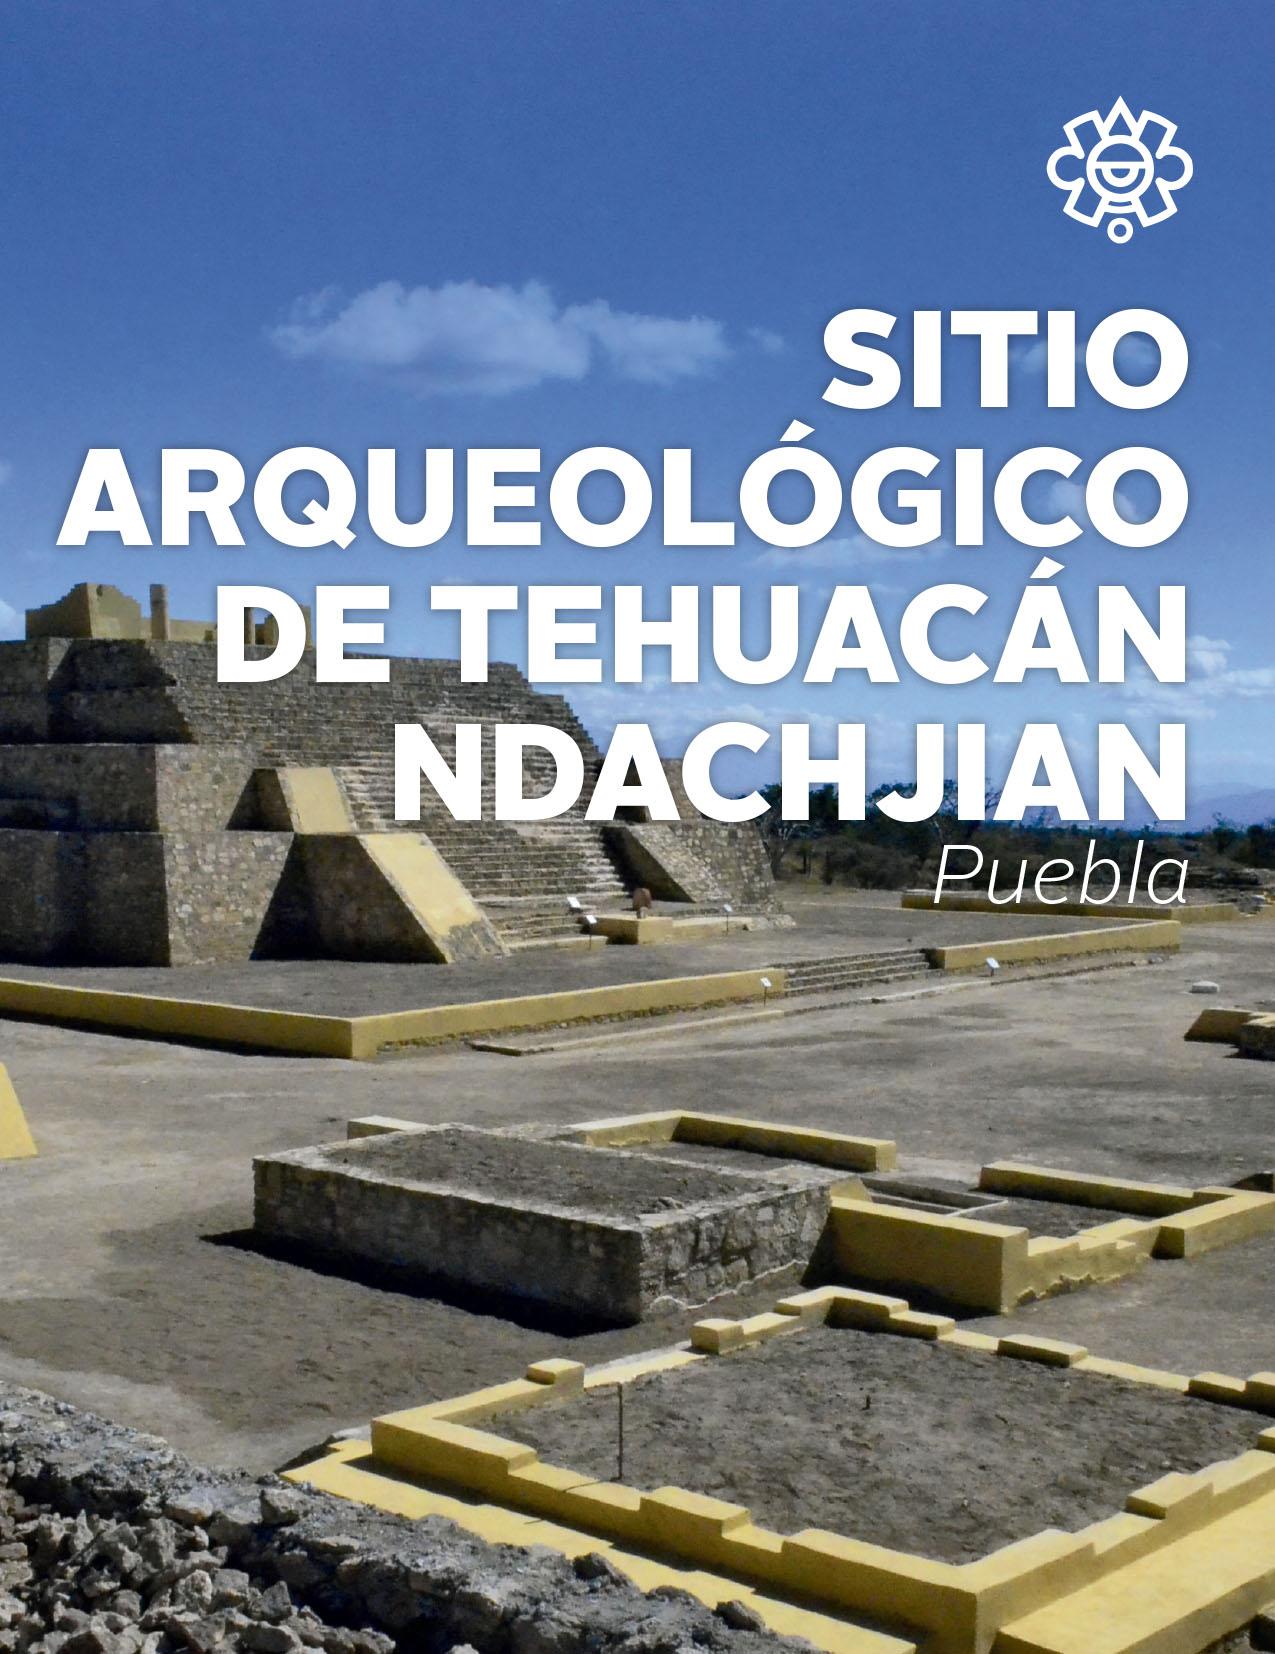 Sitio Arqueológico de Tehuacán Ndachjian